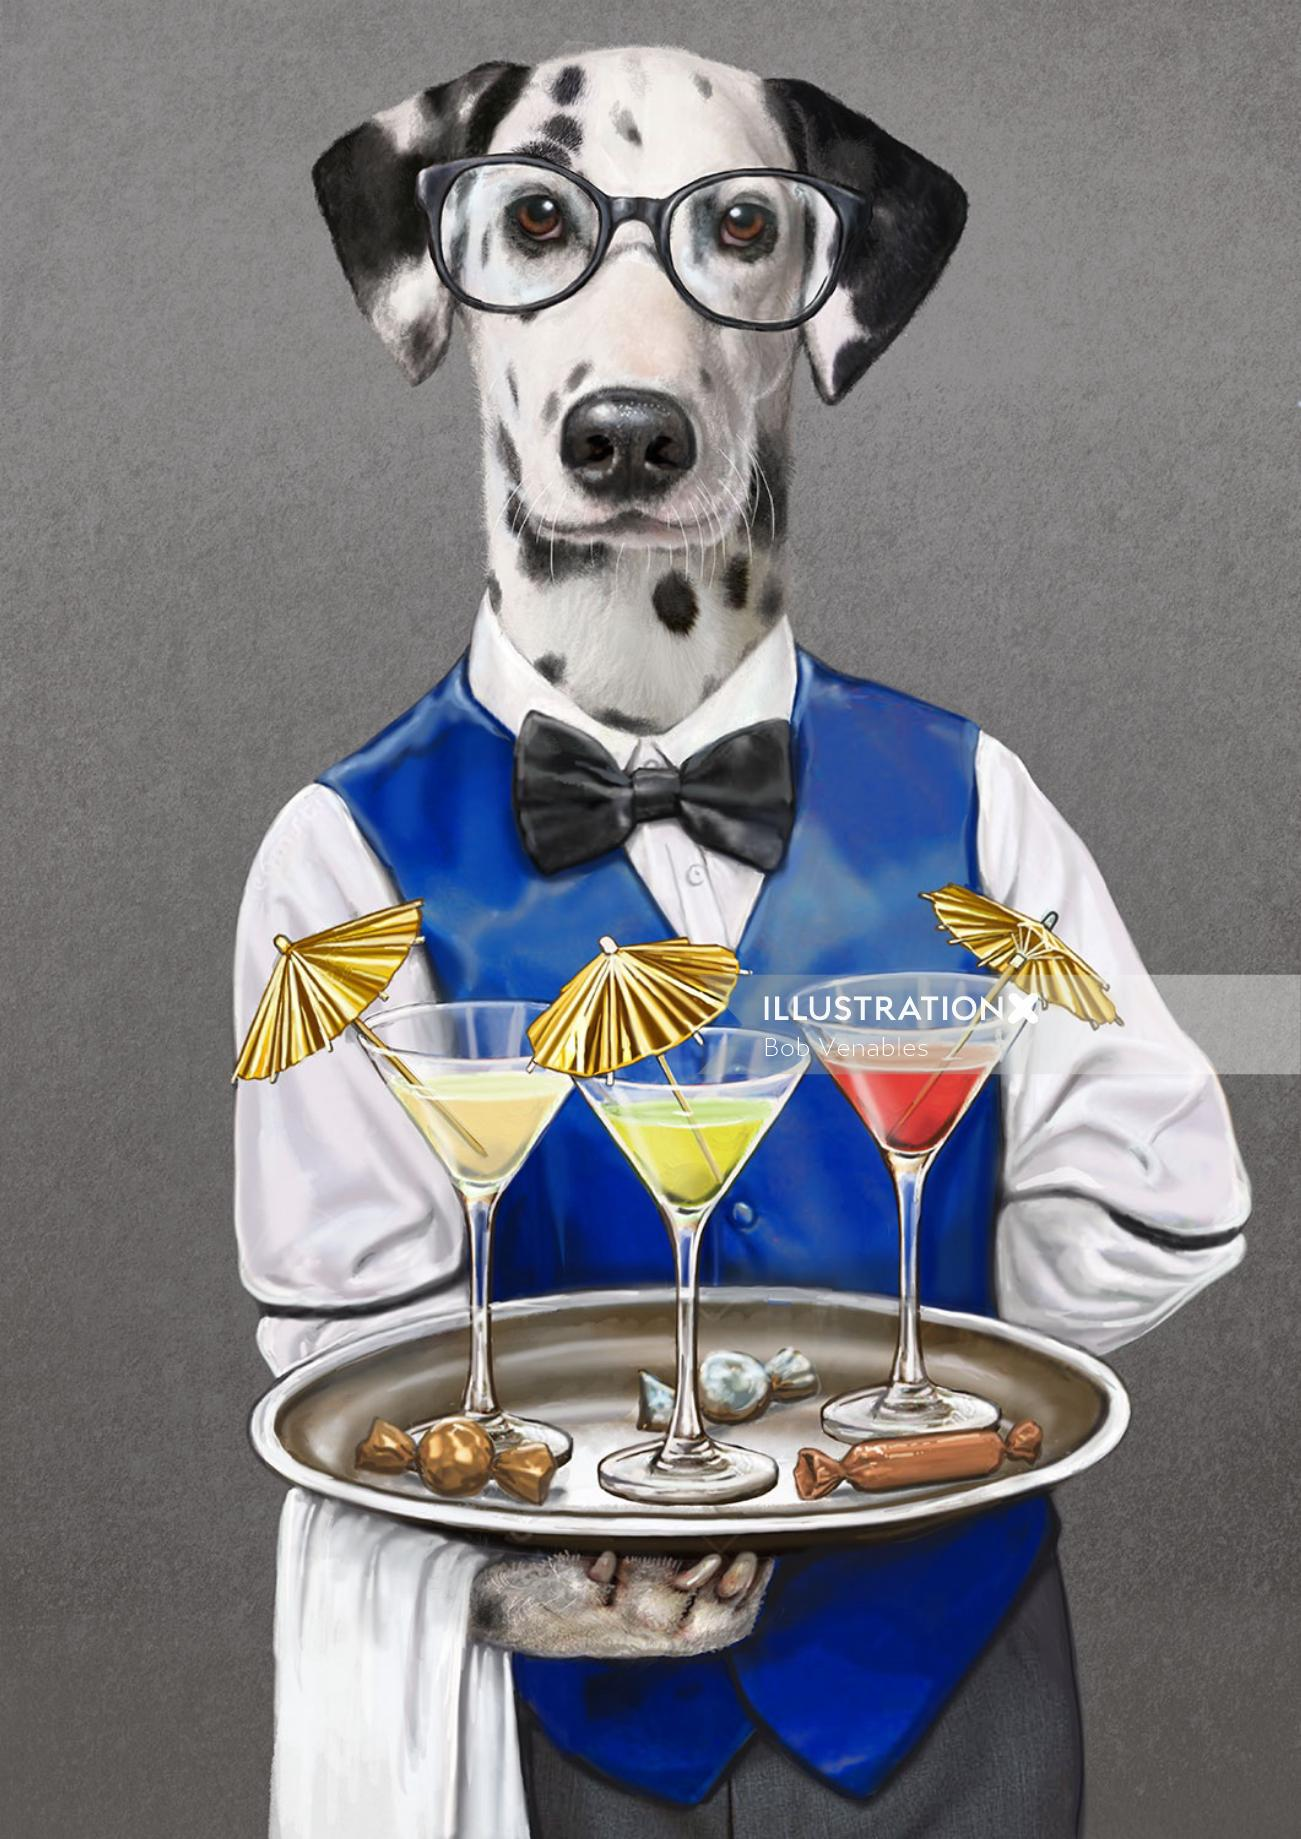 Portrait illustration of waiter dog